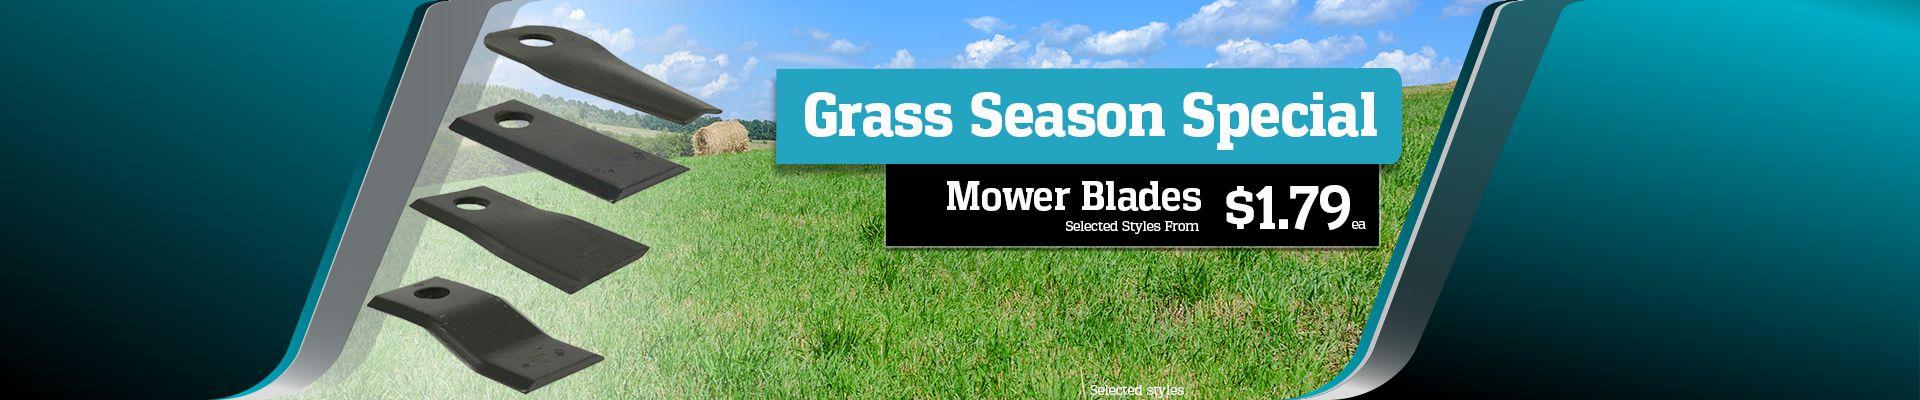 Mower Blade Special